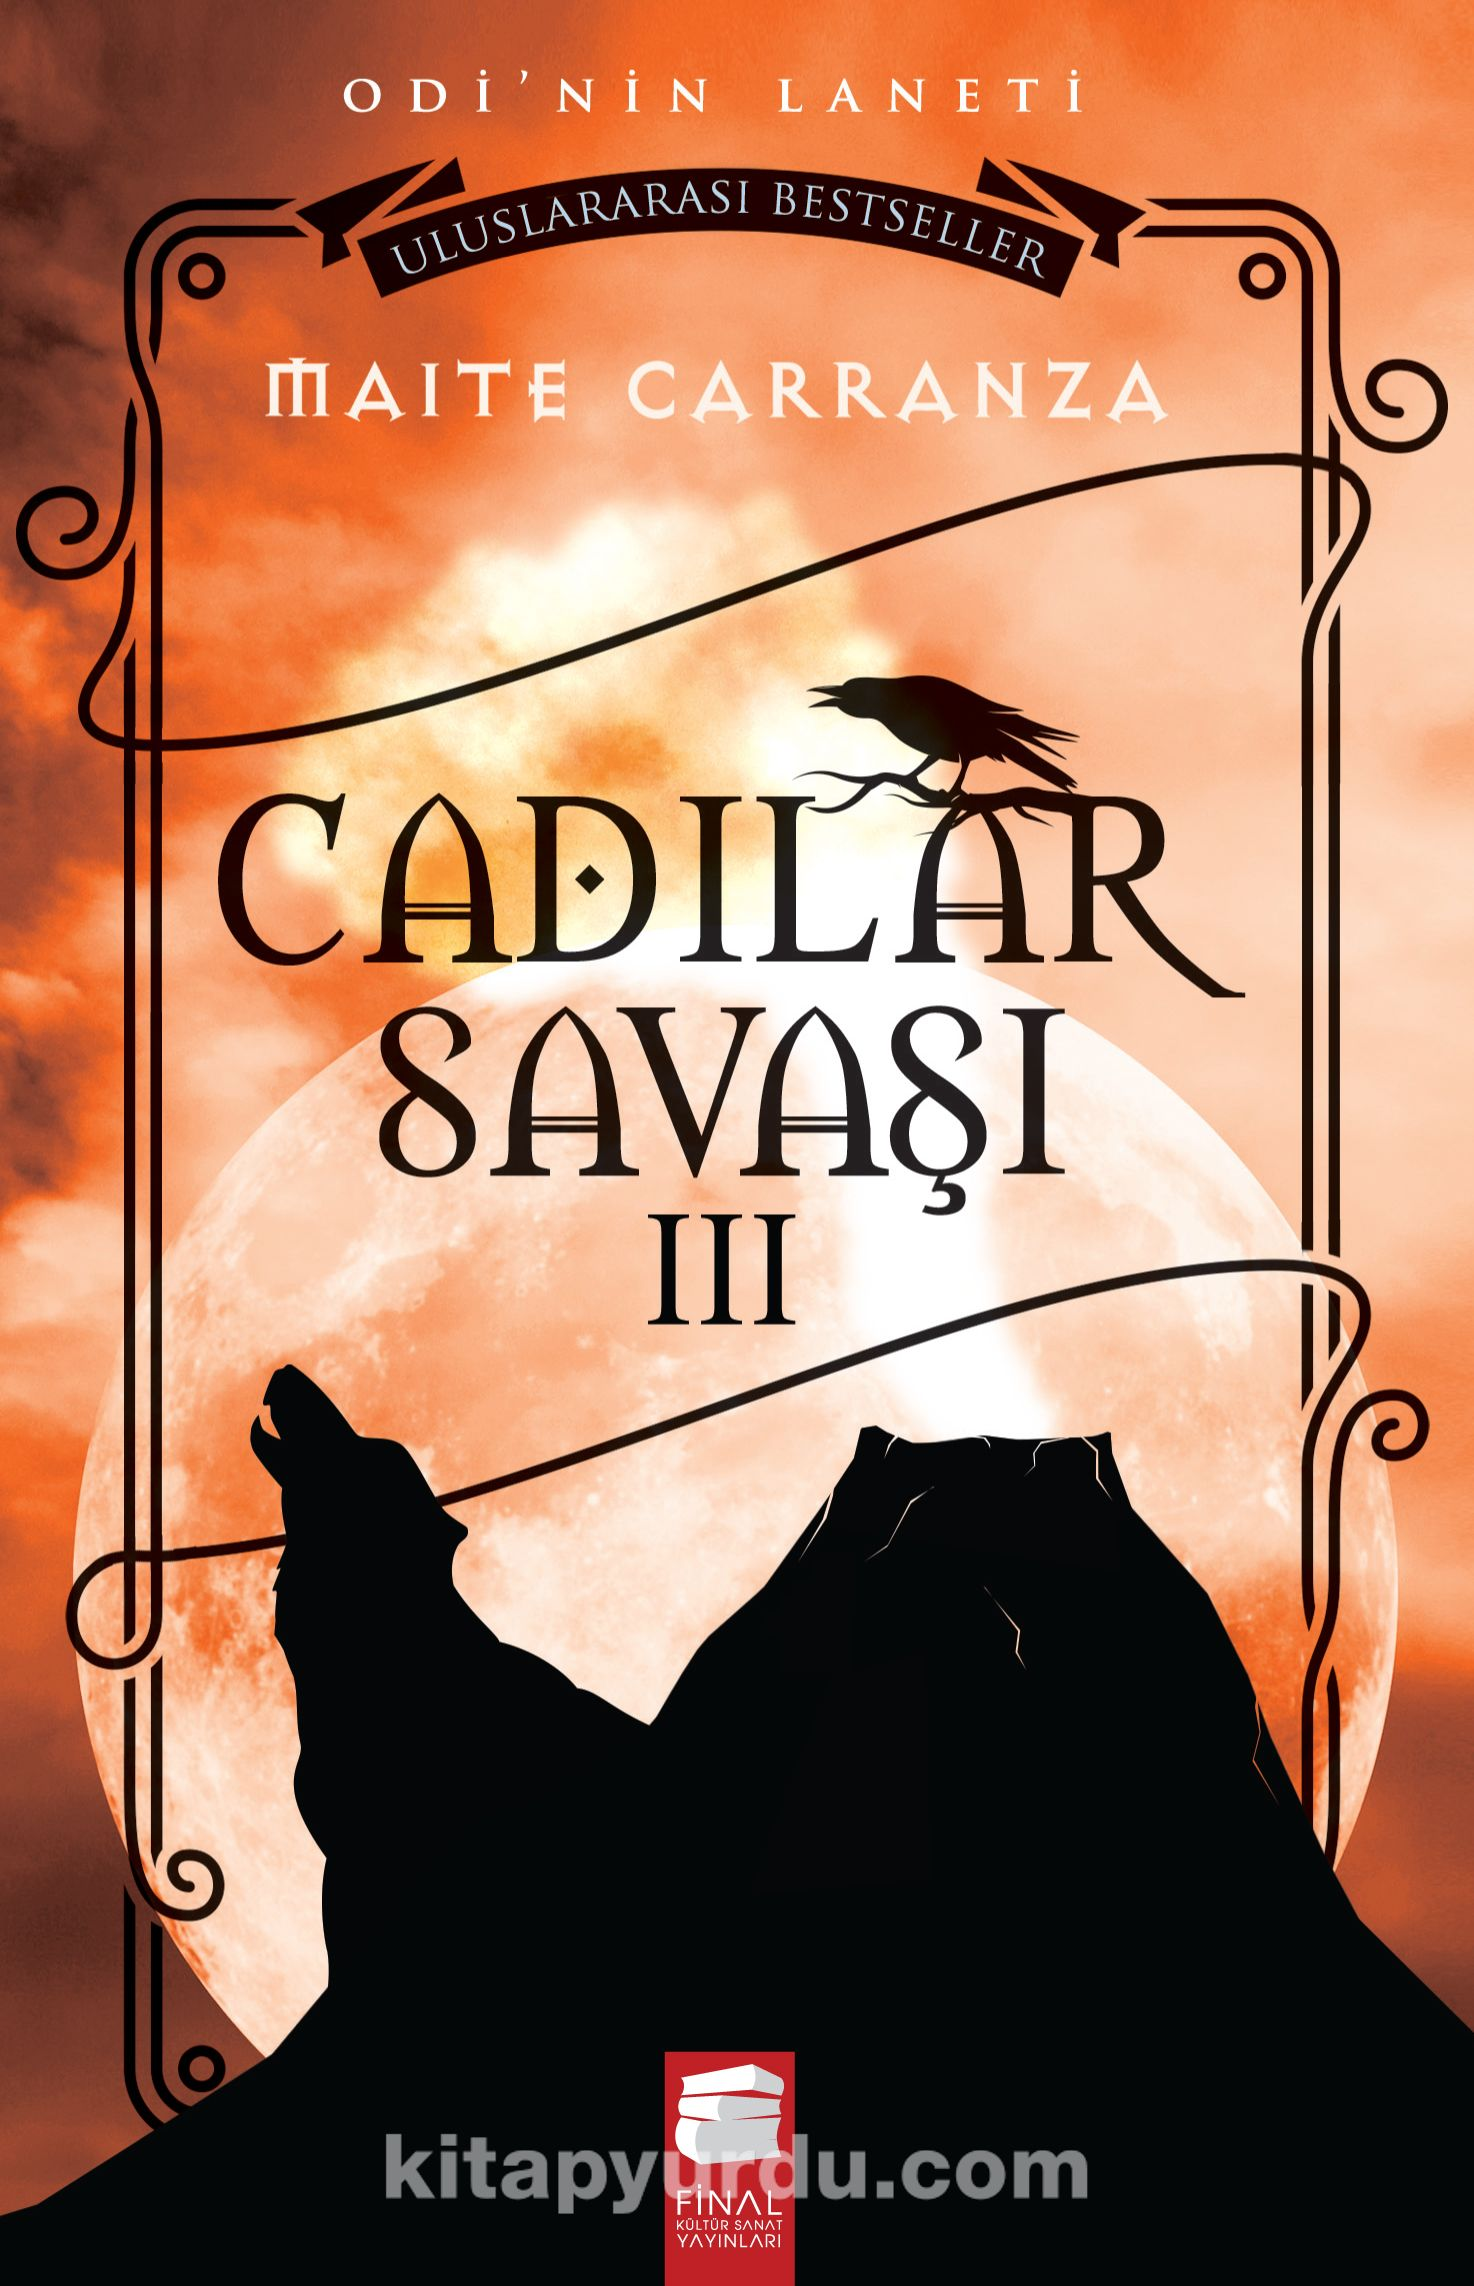 Cadılar Savaşı 3 / Odi'nin Laneti - Maite Carranza pdf epub